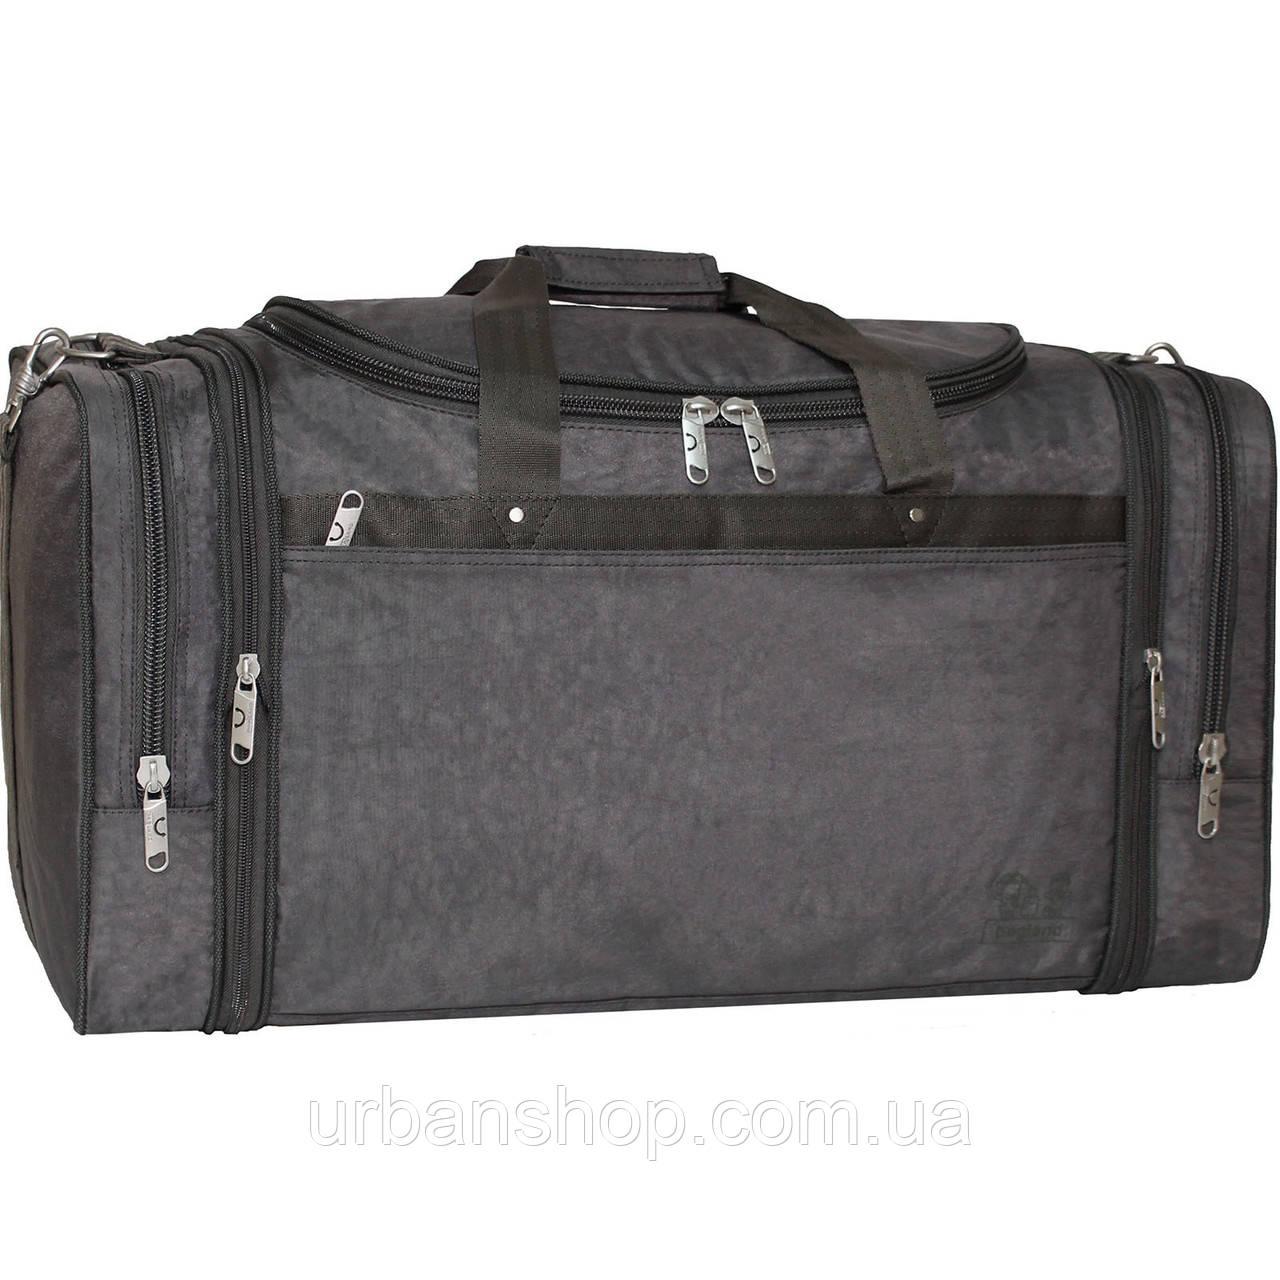 Украина Спортивная сумка Bagland Мюнхен 59 л. Хаки (0032570)